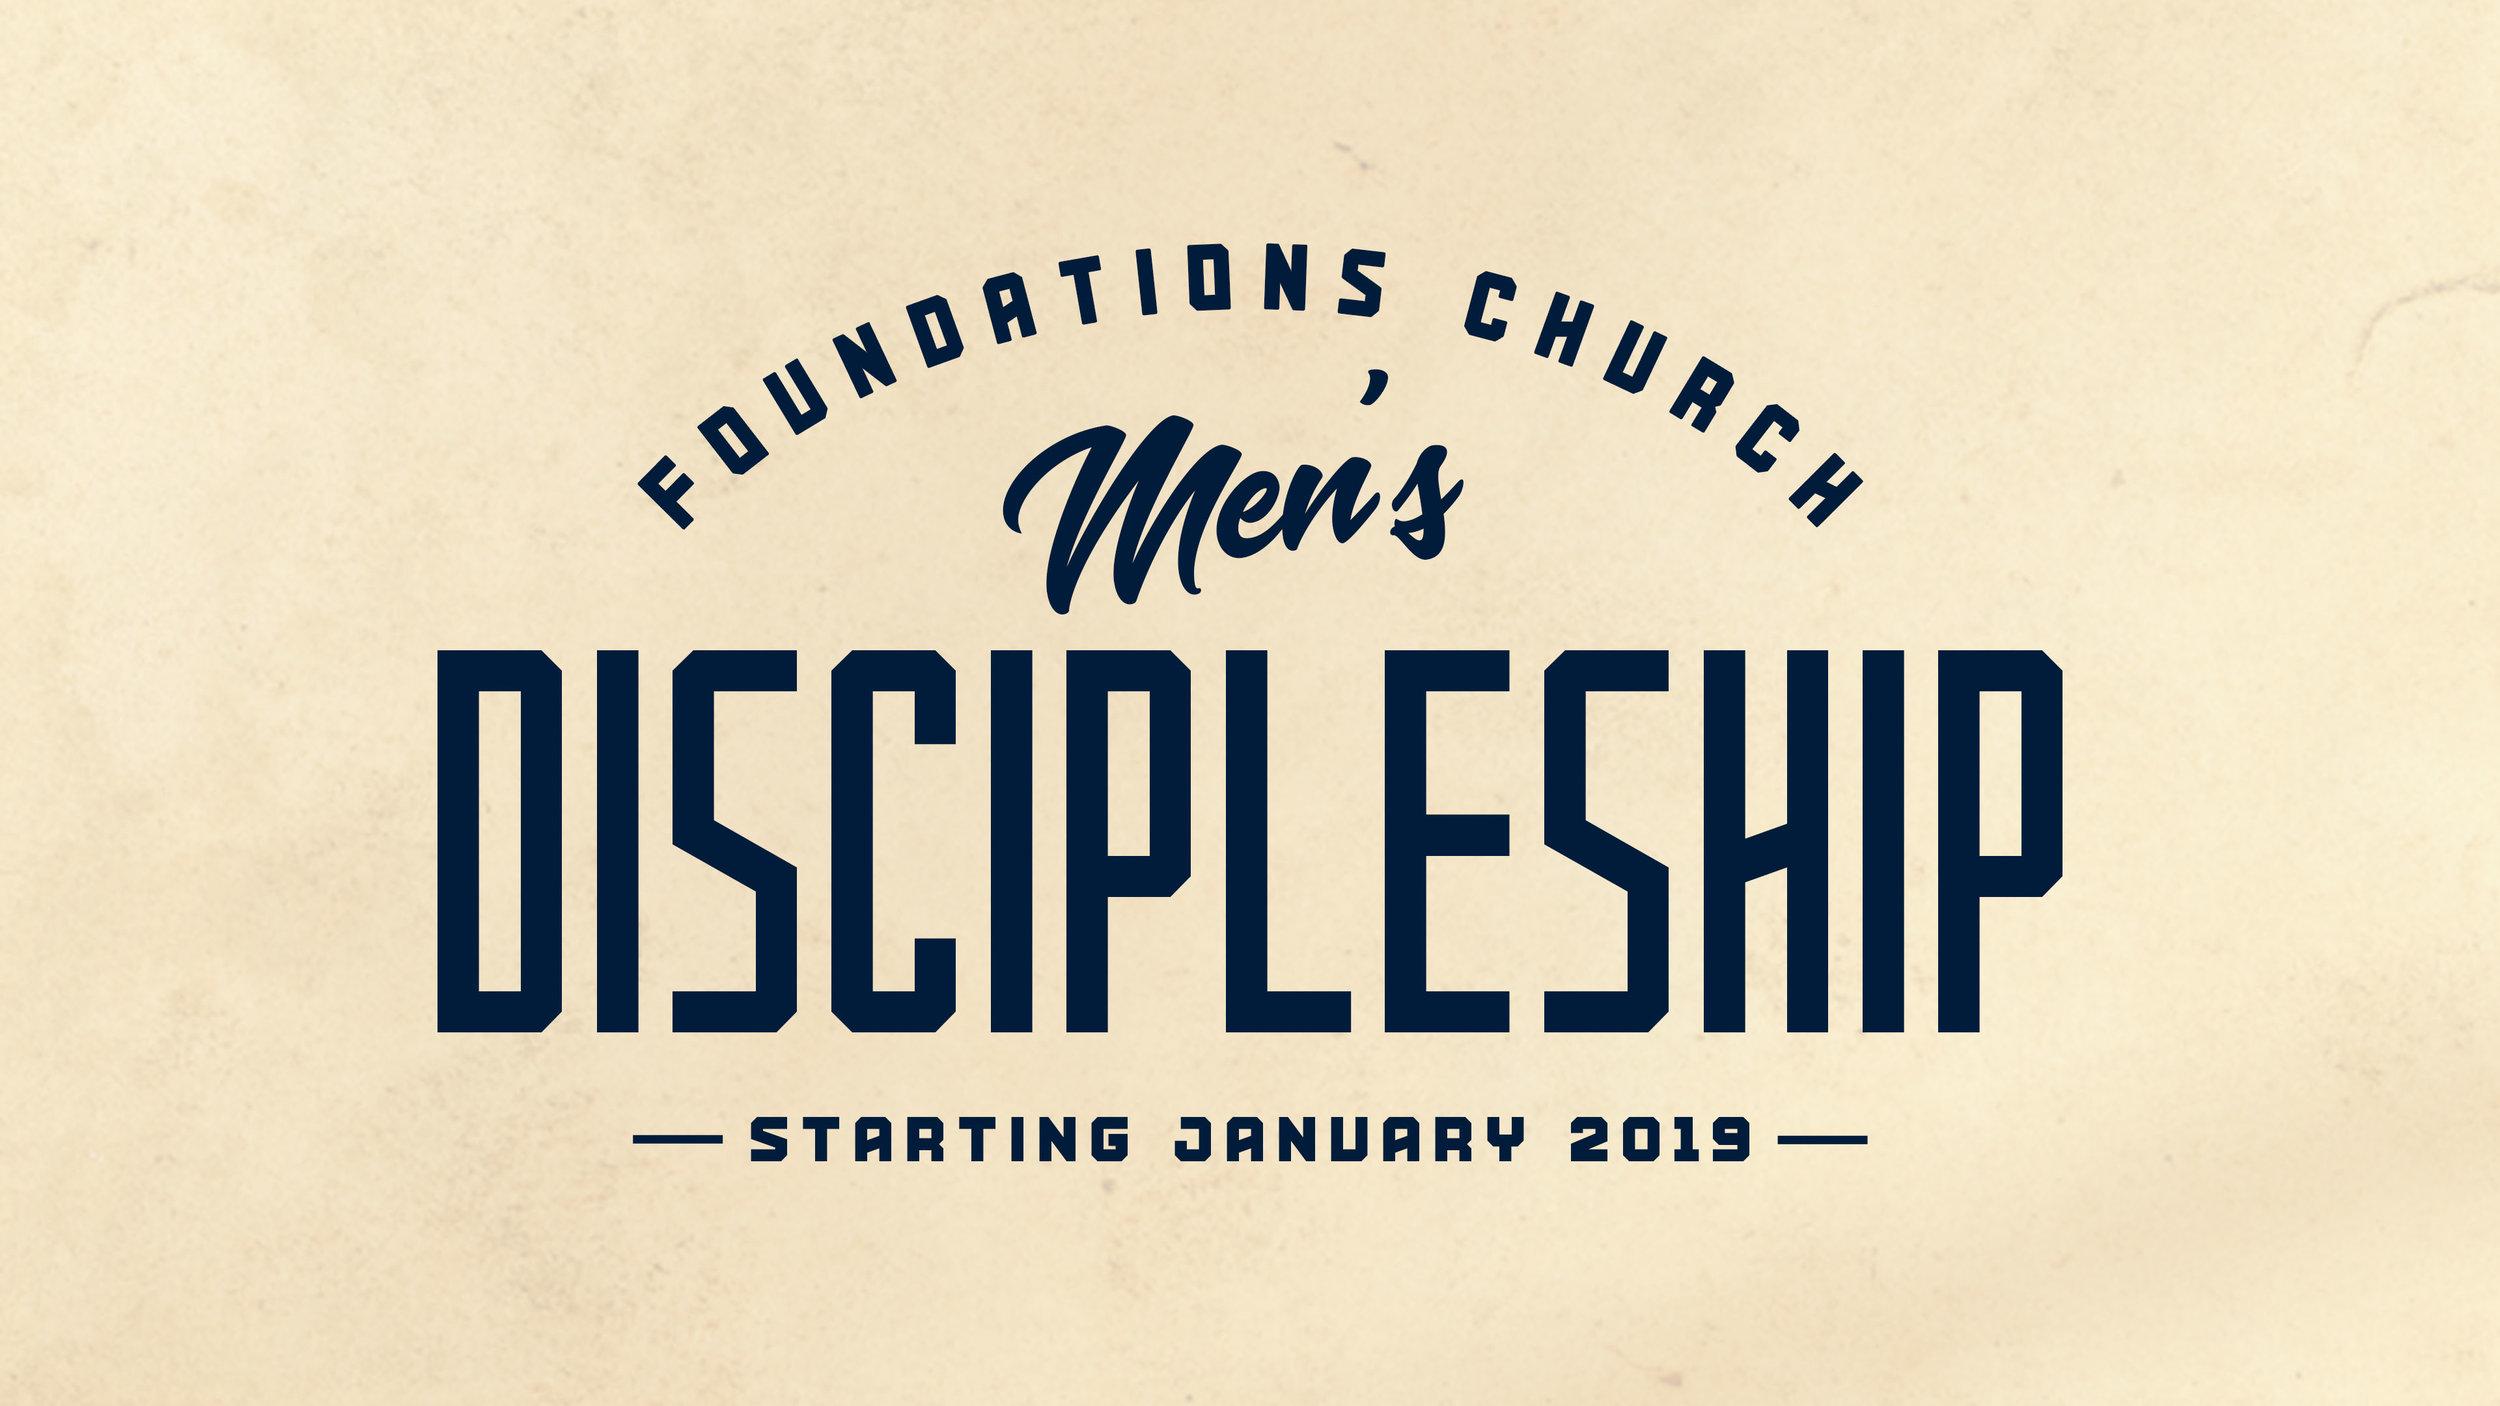 Mens discipleship simple.jpg